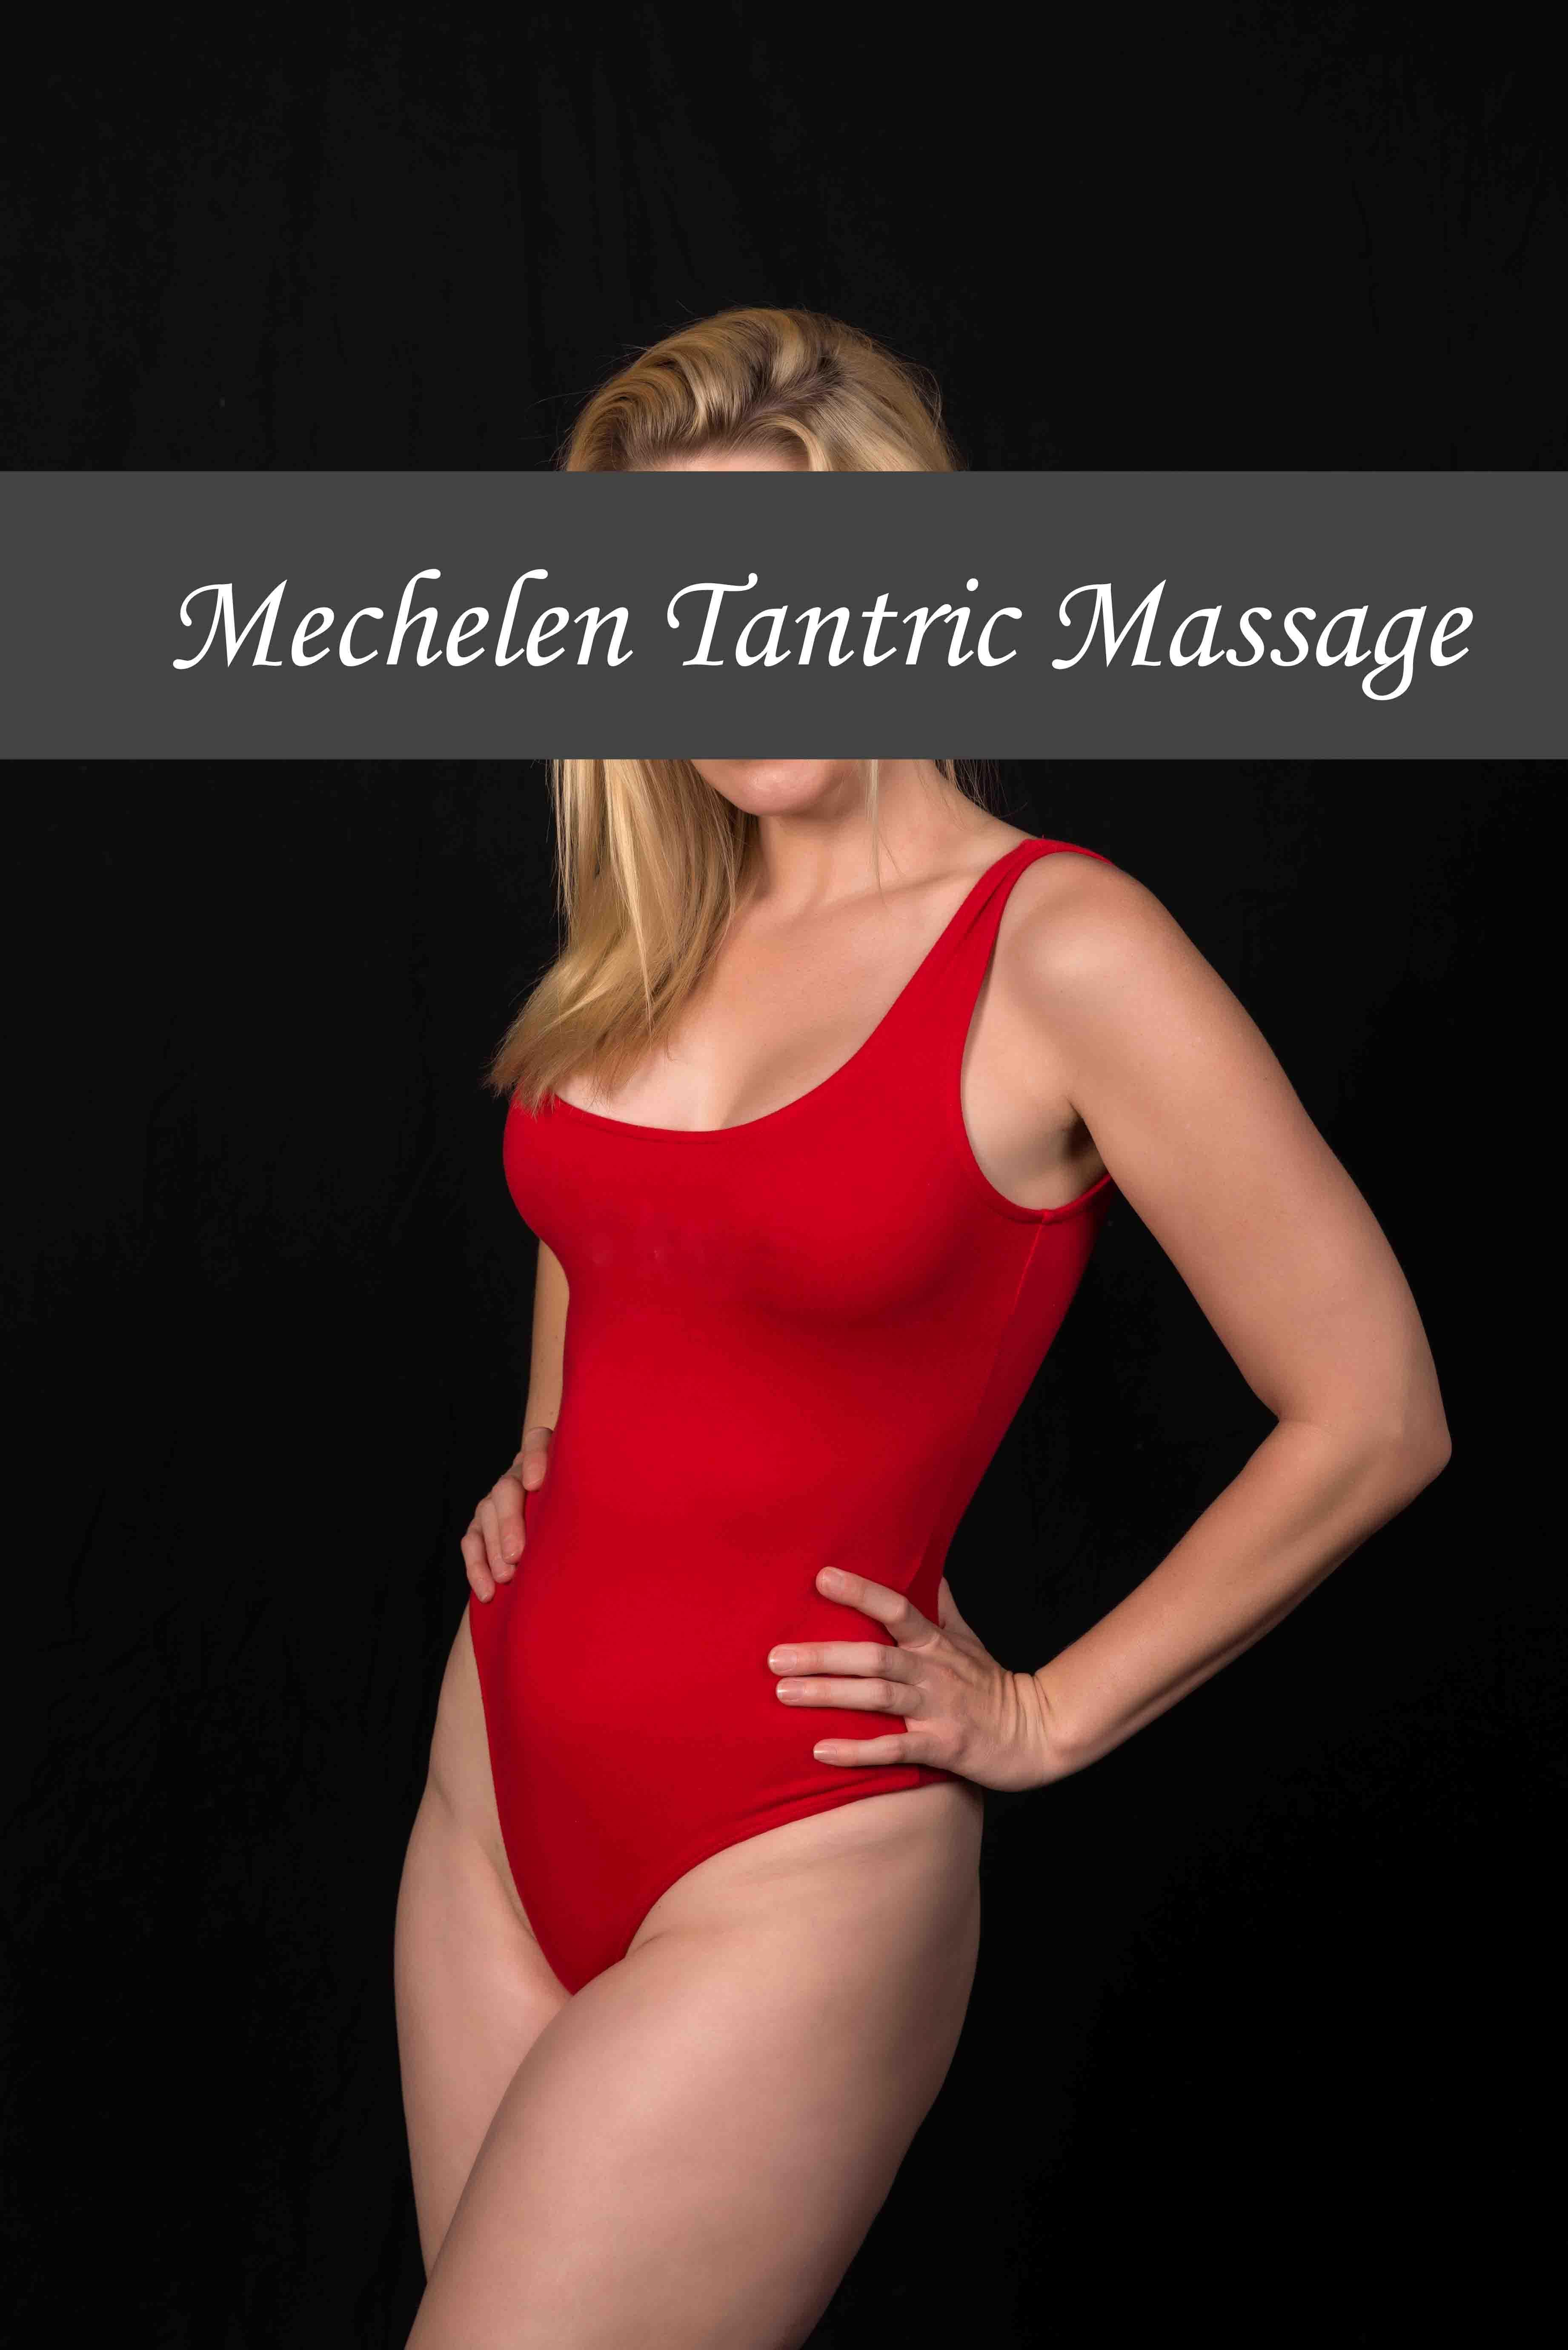 Isabelle from Mechelen Tantric Massage